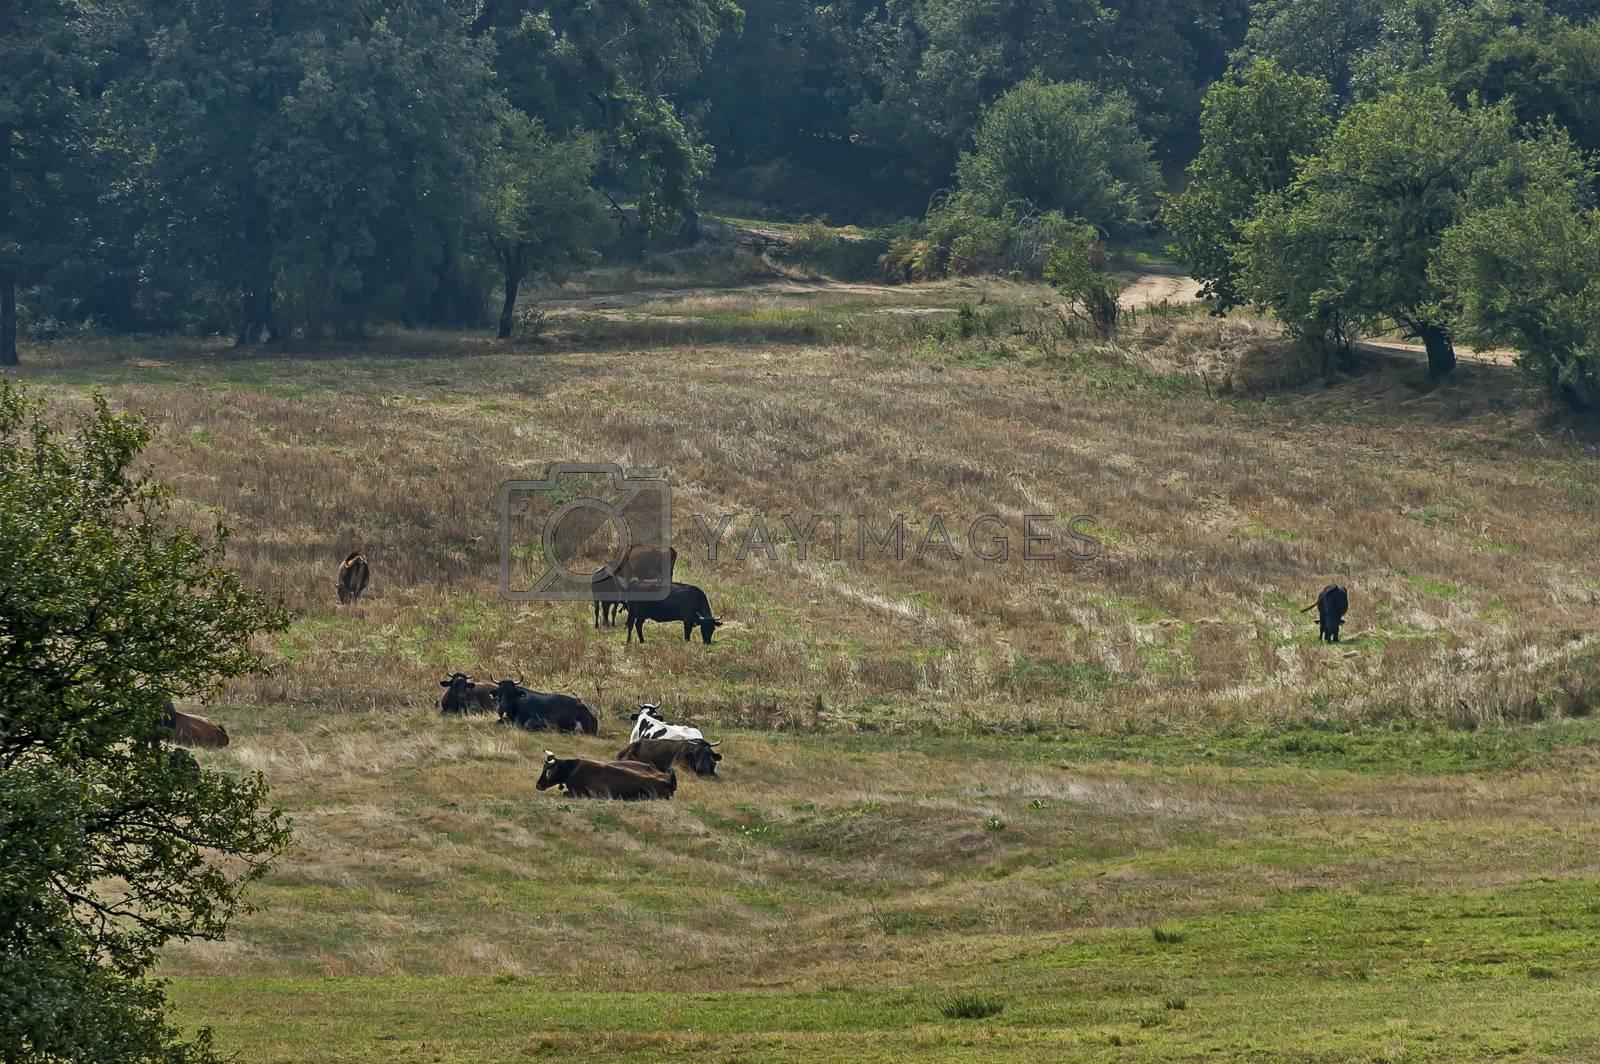 Herd of black, brown and white cows at autumn field, Sredna Gora, Mountain, Bulgaria